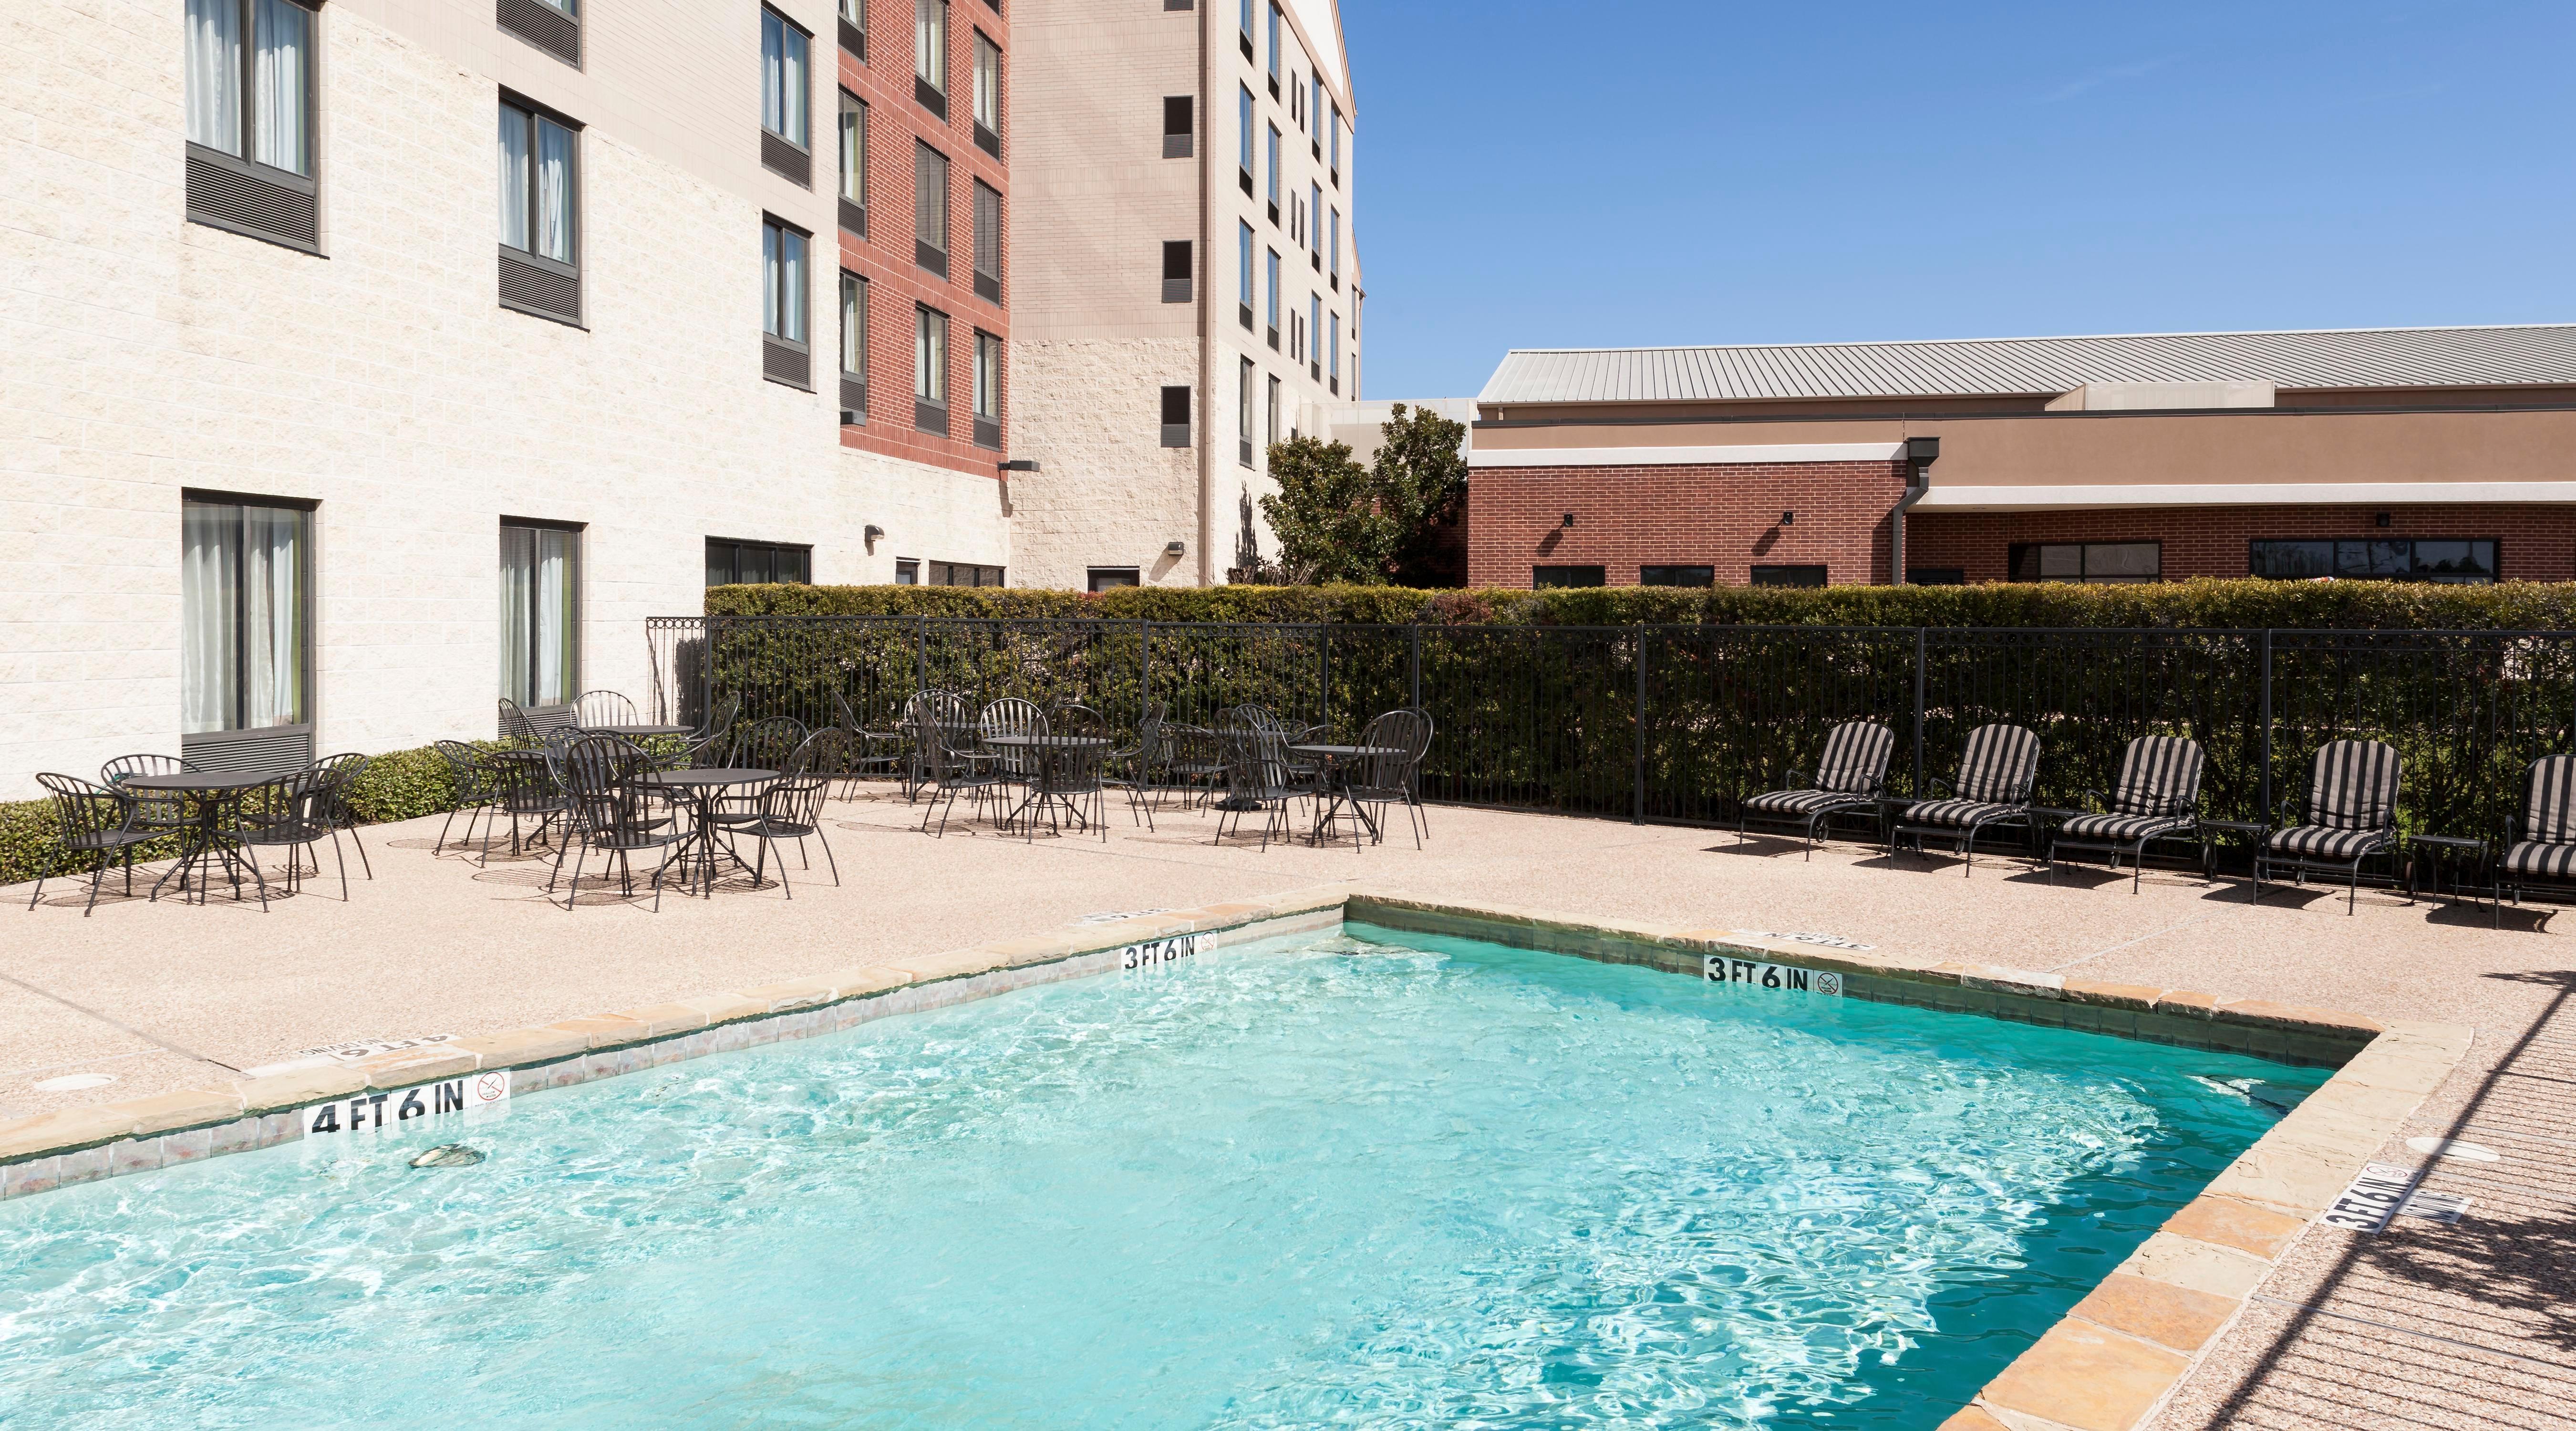 Hilton Garden Inn Dallas Duncanville In Duncanville Tx